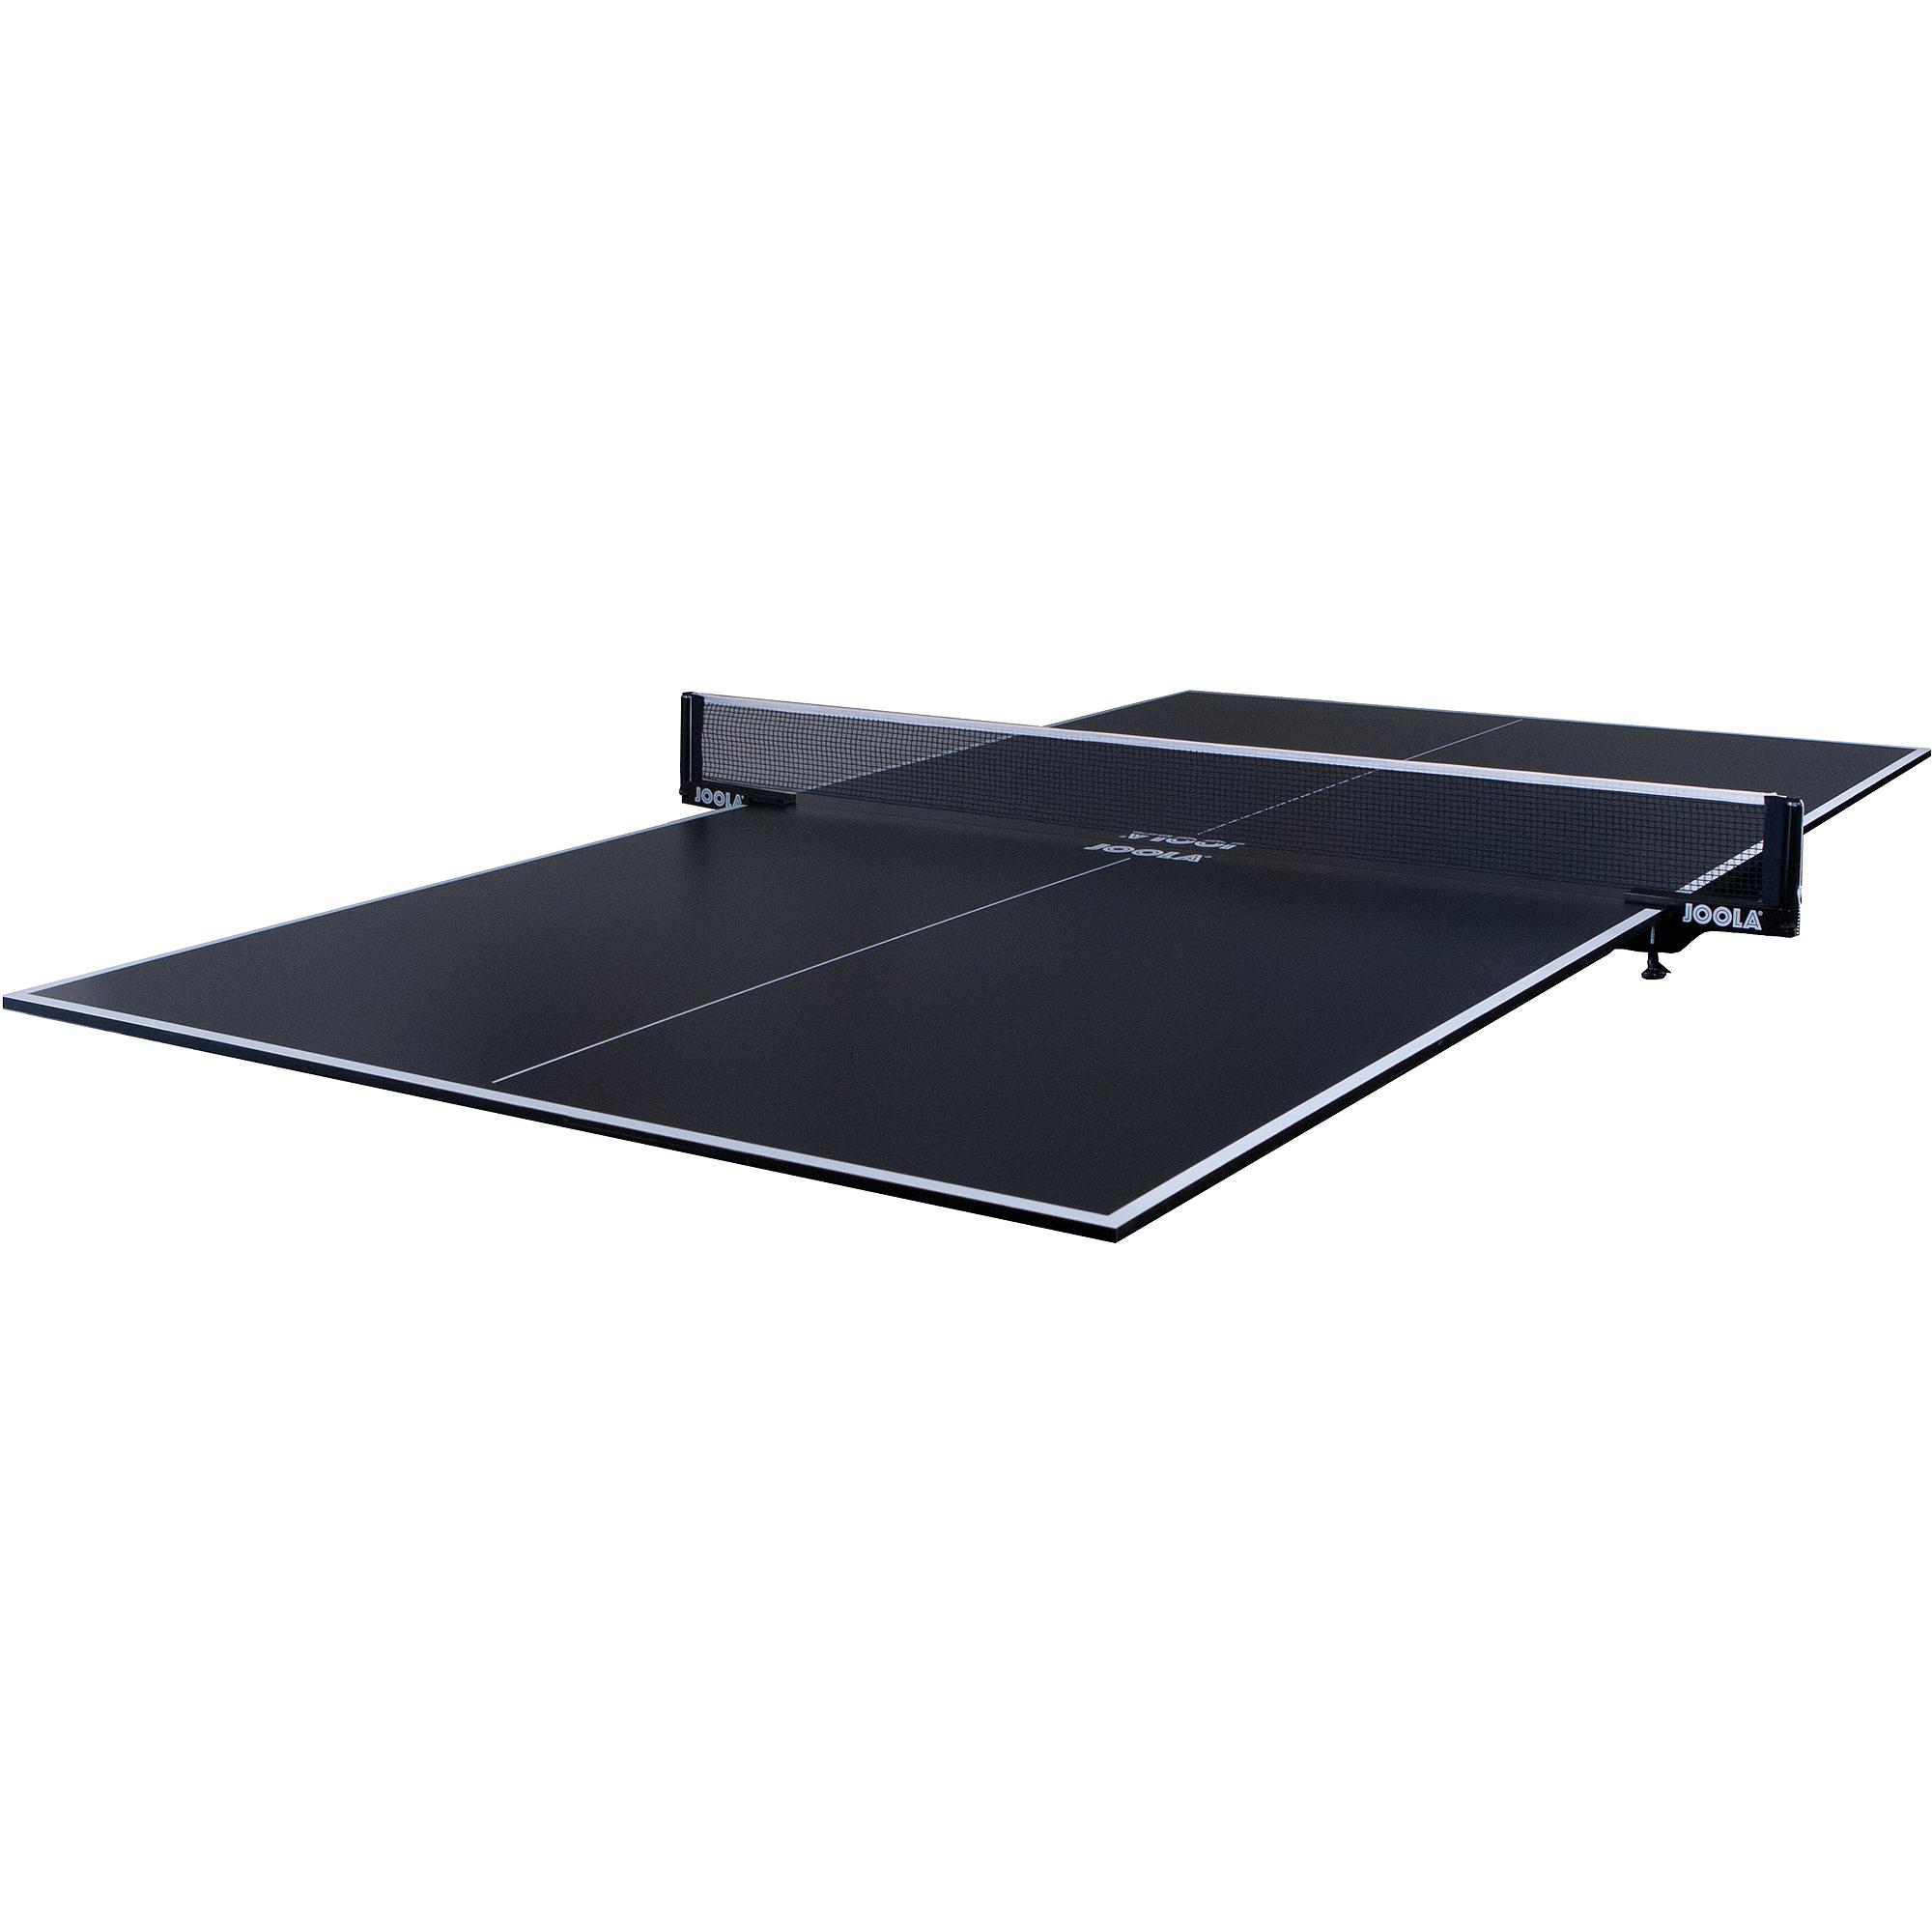 Perfect Stiga Table Tennis Conversion Top For Pool Tables   Walmart.com